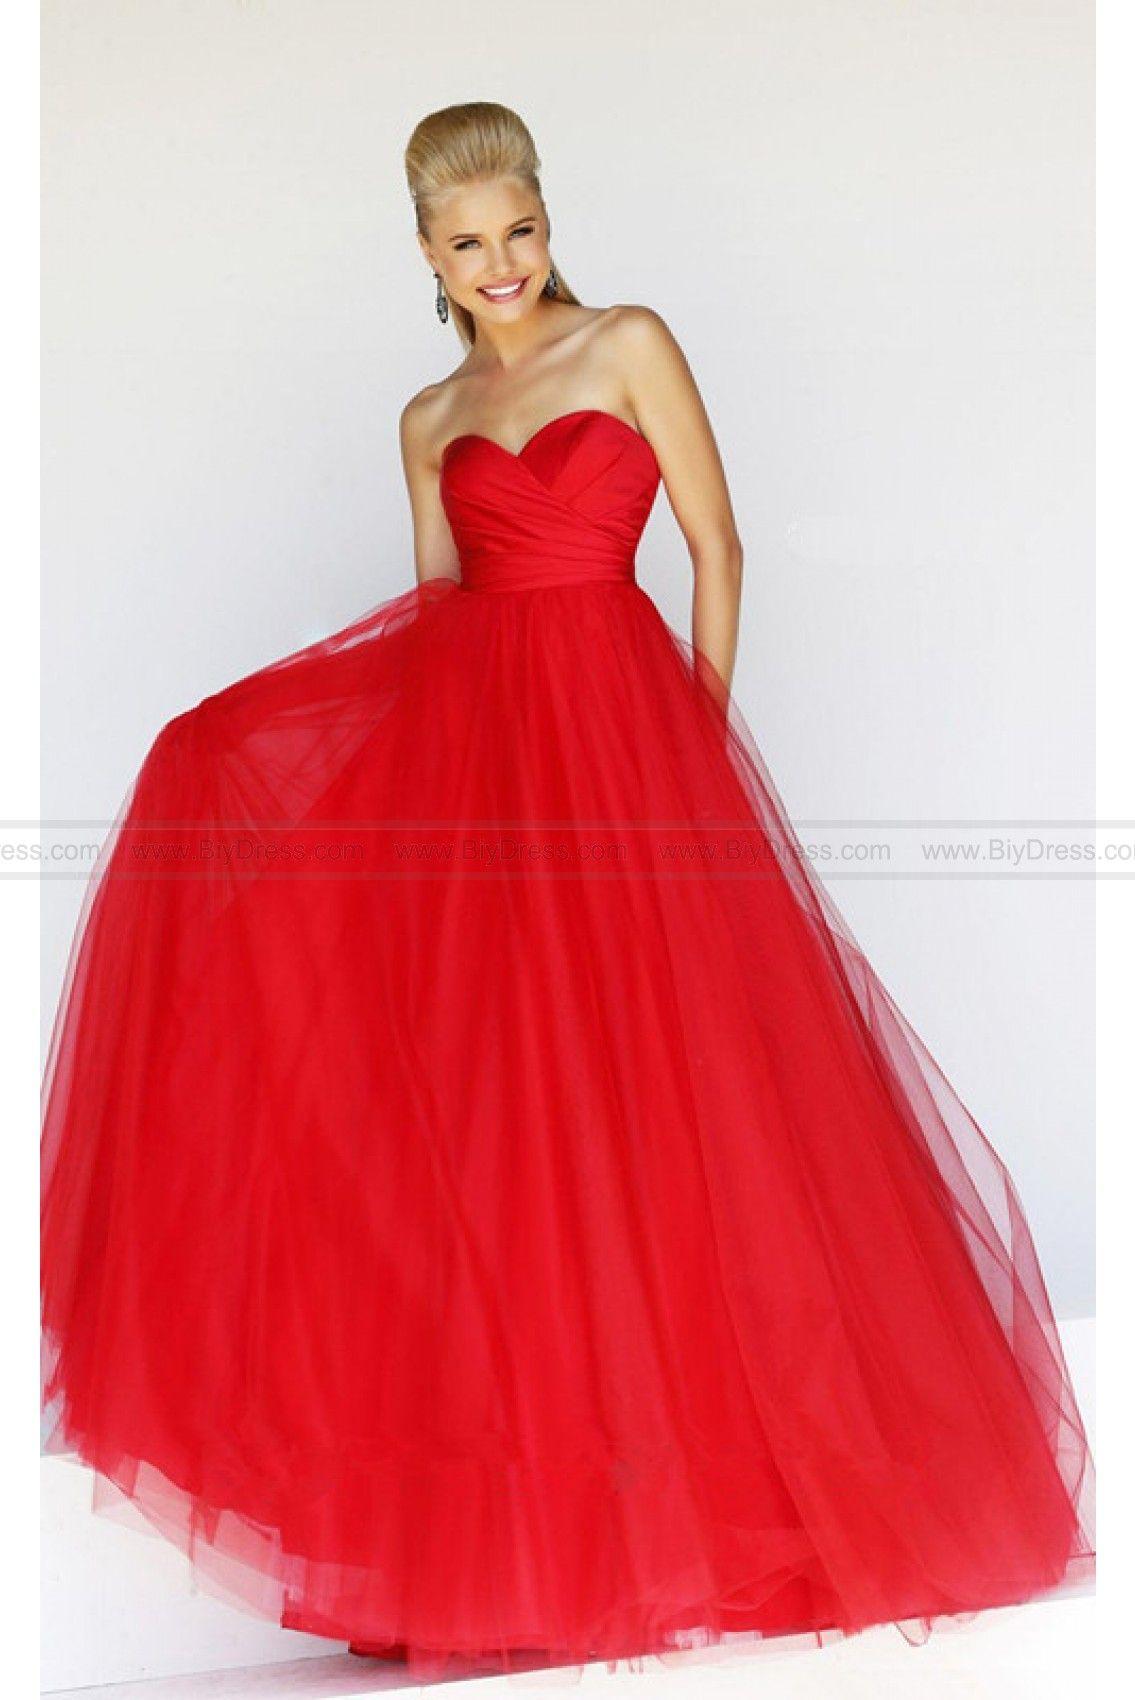 Sherri hill prom dresses pinterest dress prom prom and